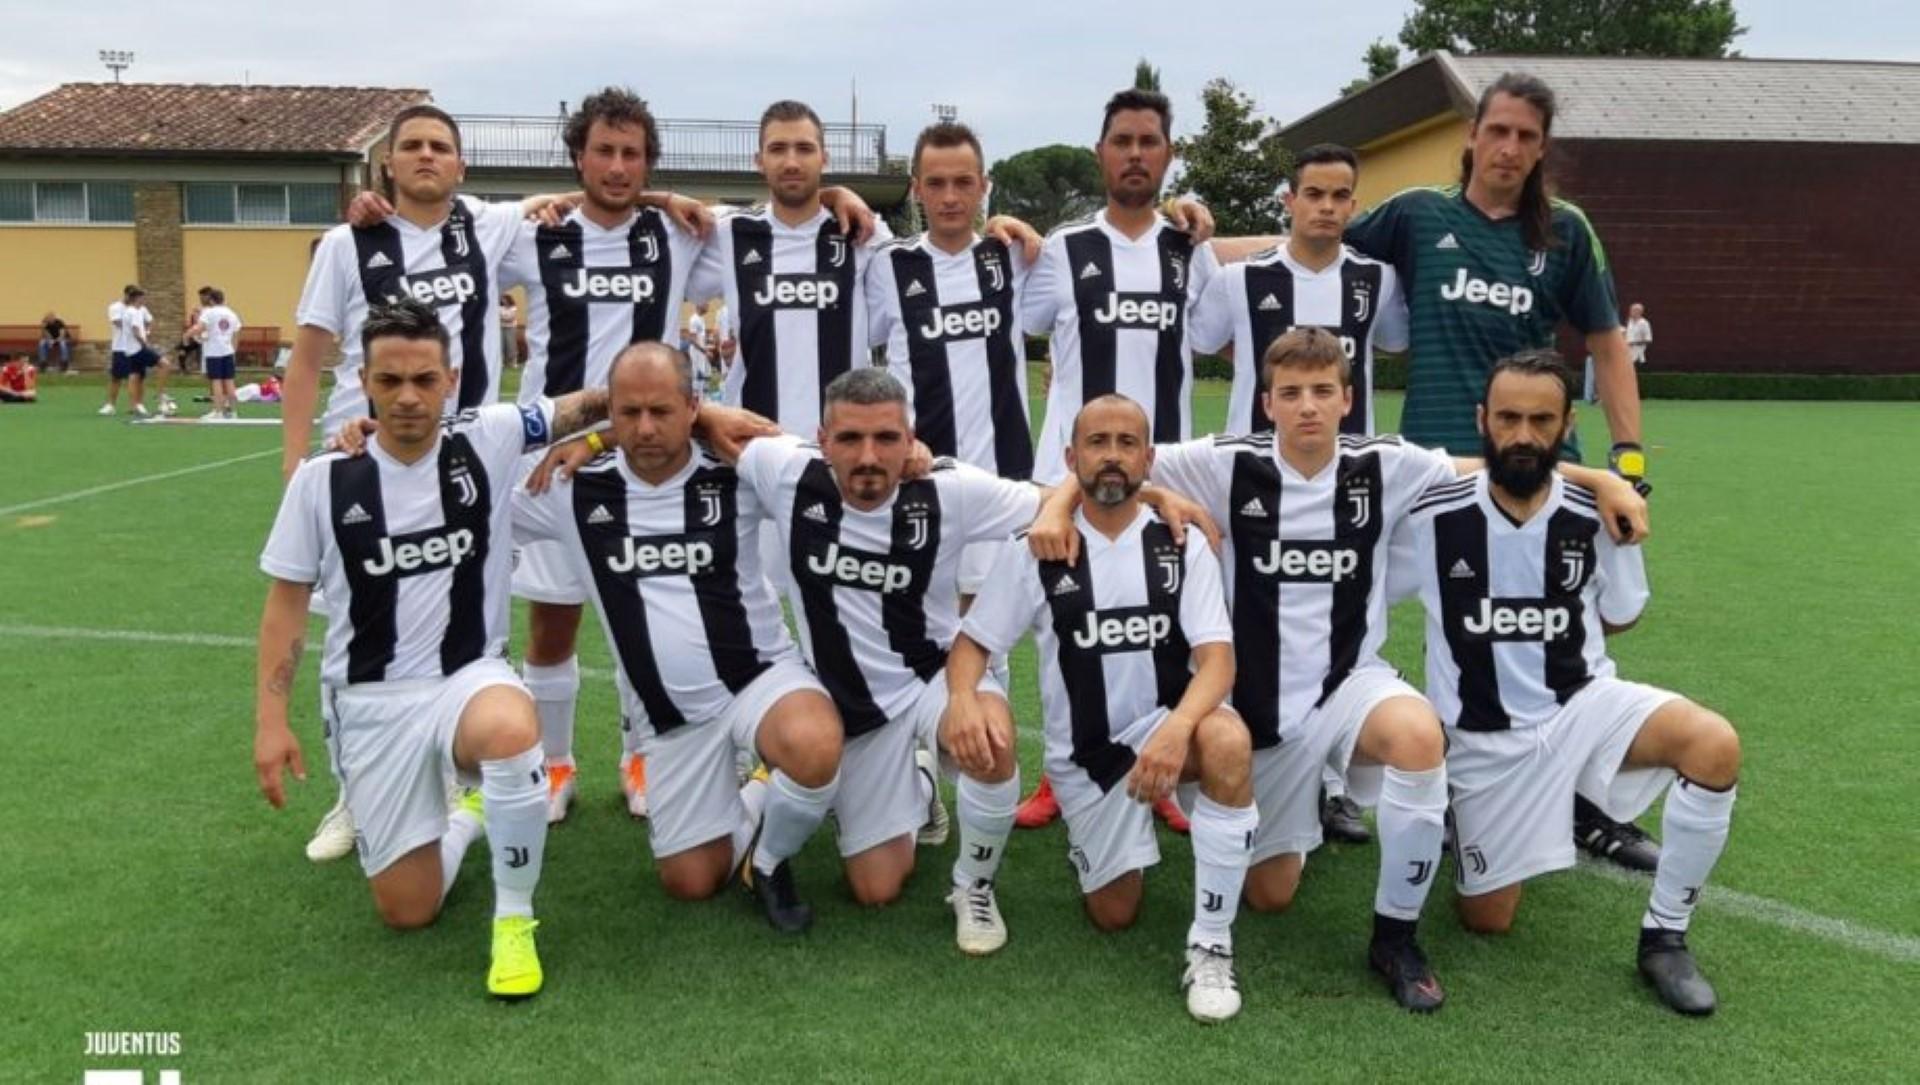 Juventus FC - Morethanfootball.eu